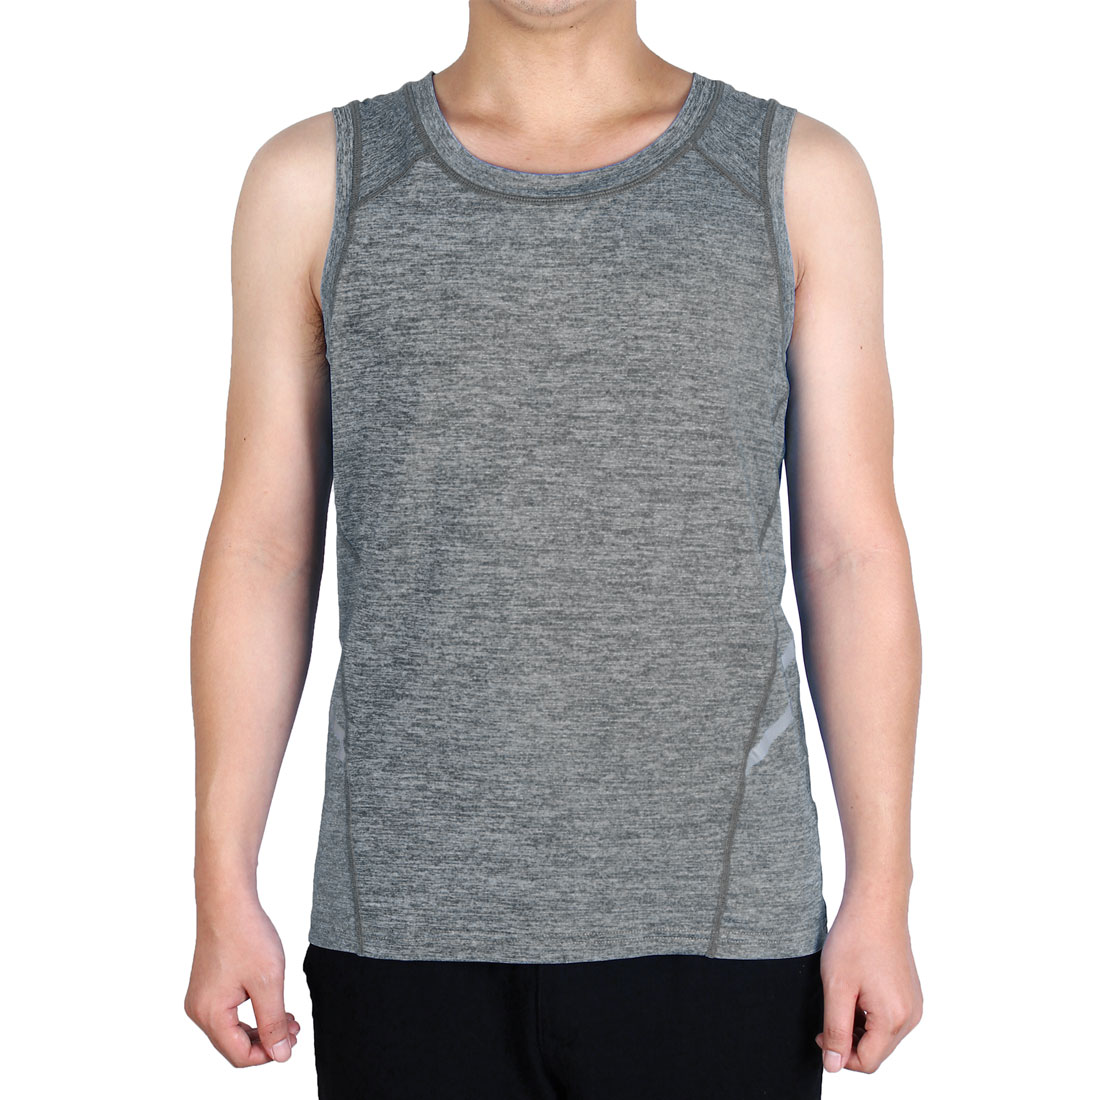 Men Sleeveless T-shirt Activewear Vest Training Exercise Sports Tank Top Gray XL